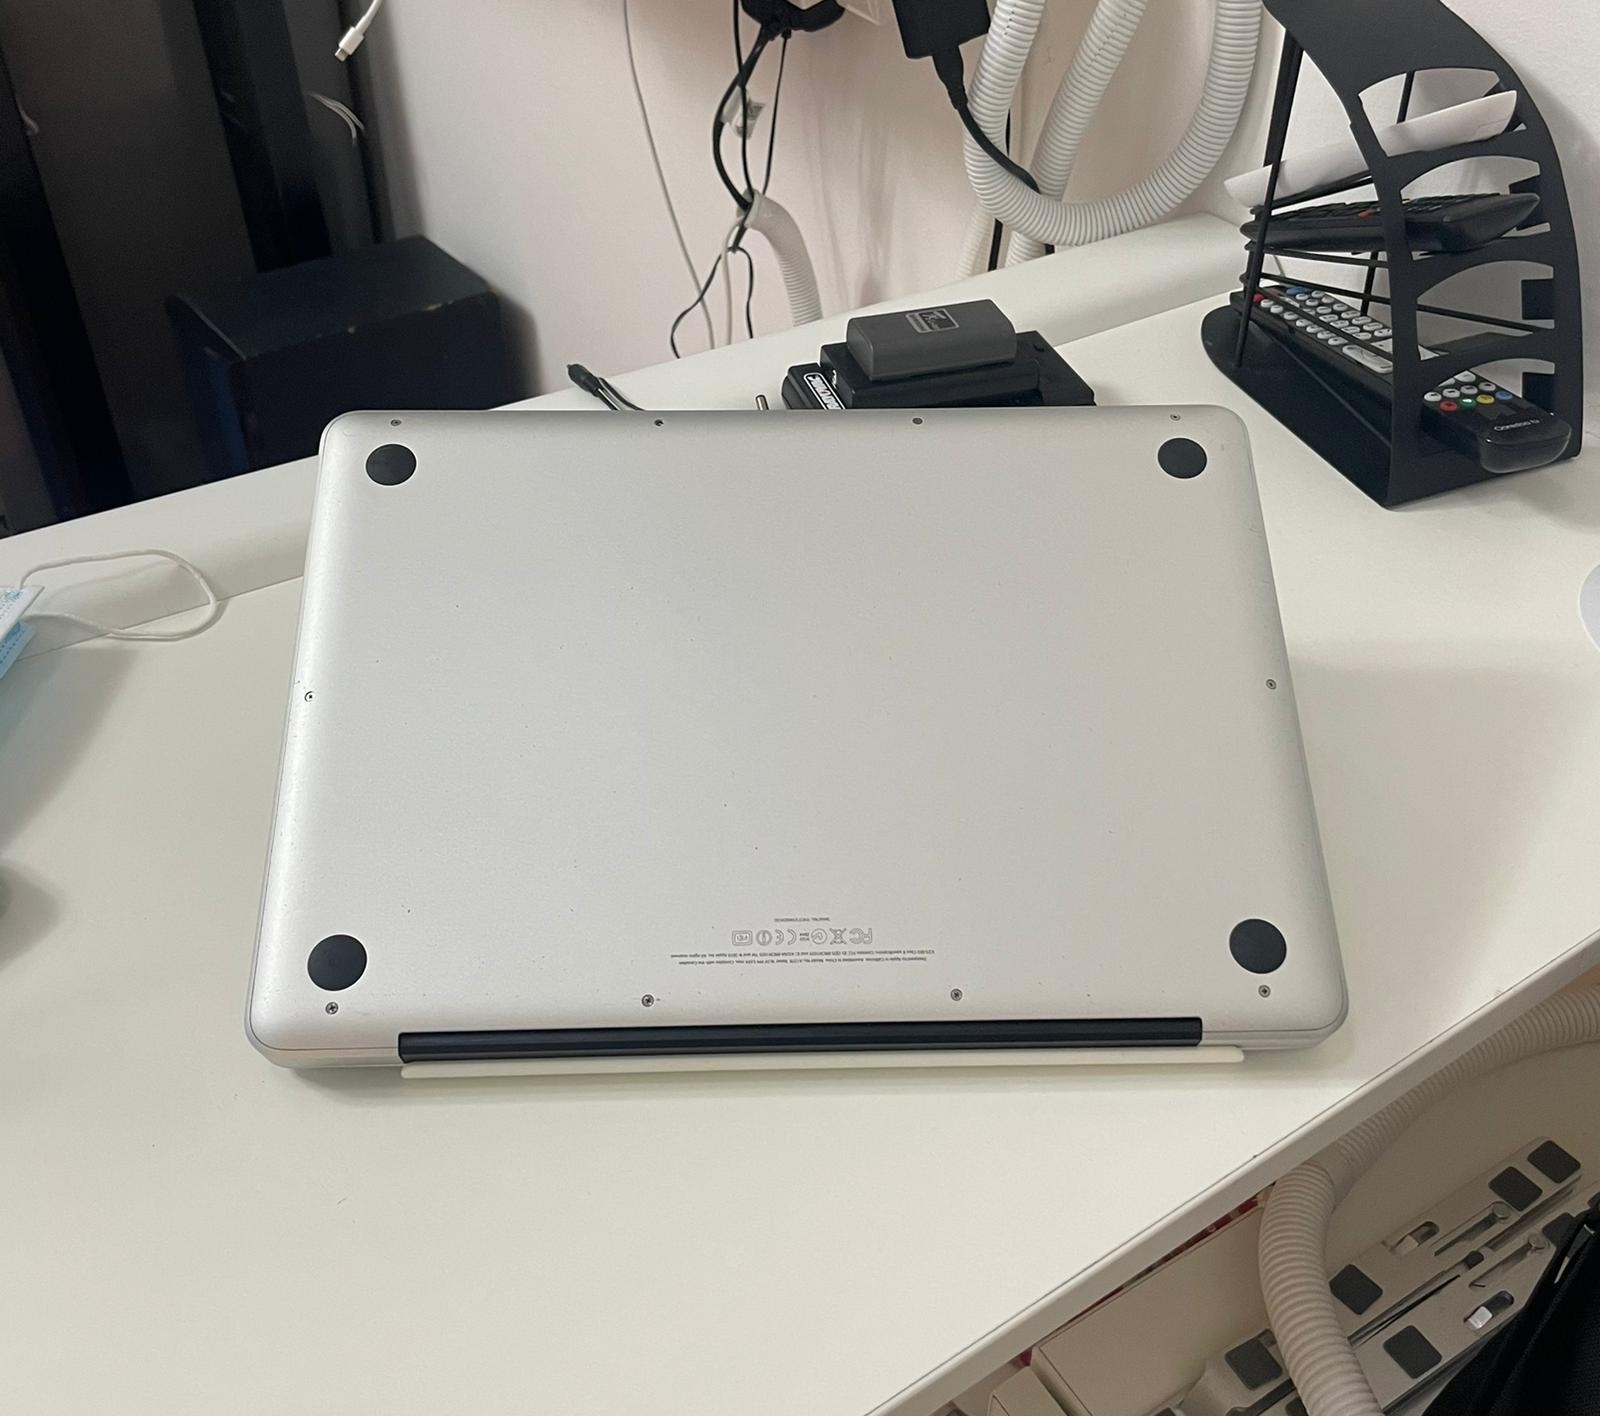 Macbook pro Core i5 Ram 8GB RAM 640GB HDD